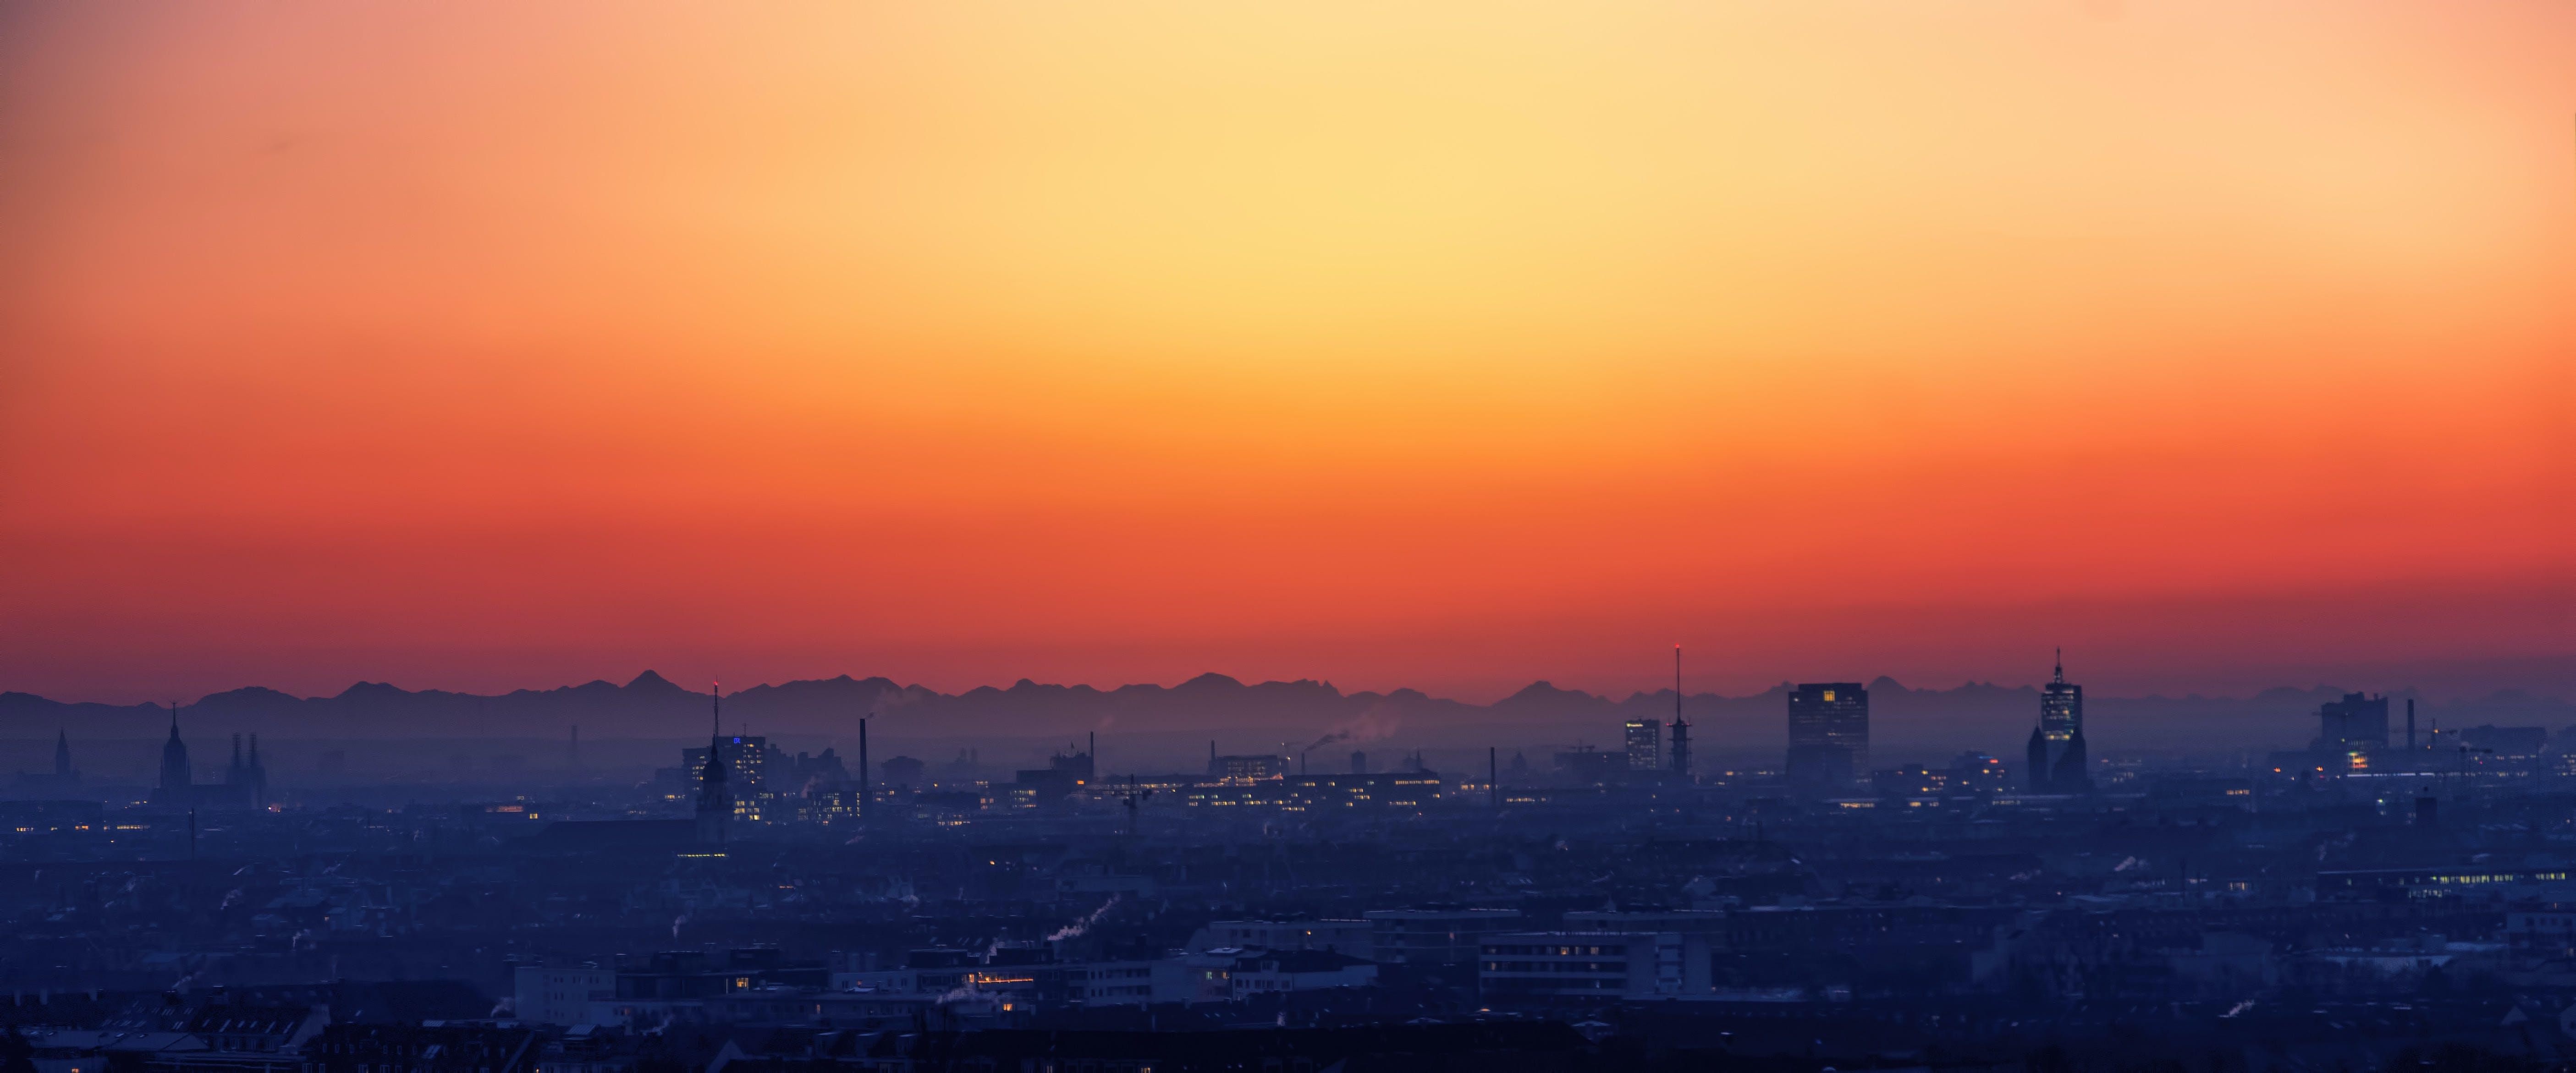 Kostenloses Stock Foto zu stadt, dämmerung, landschaft, himmel